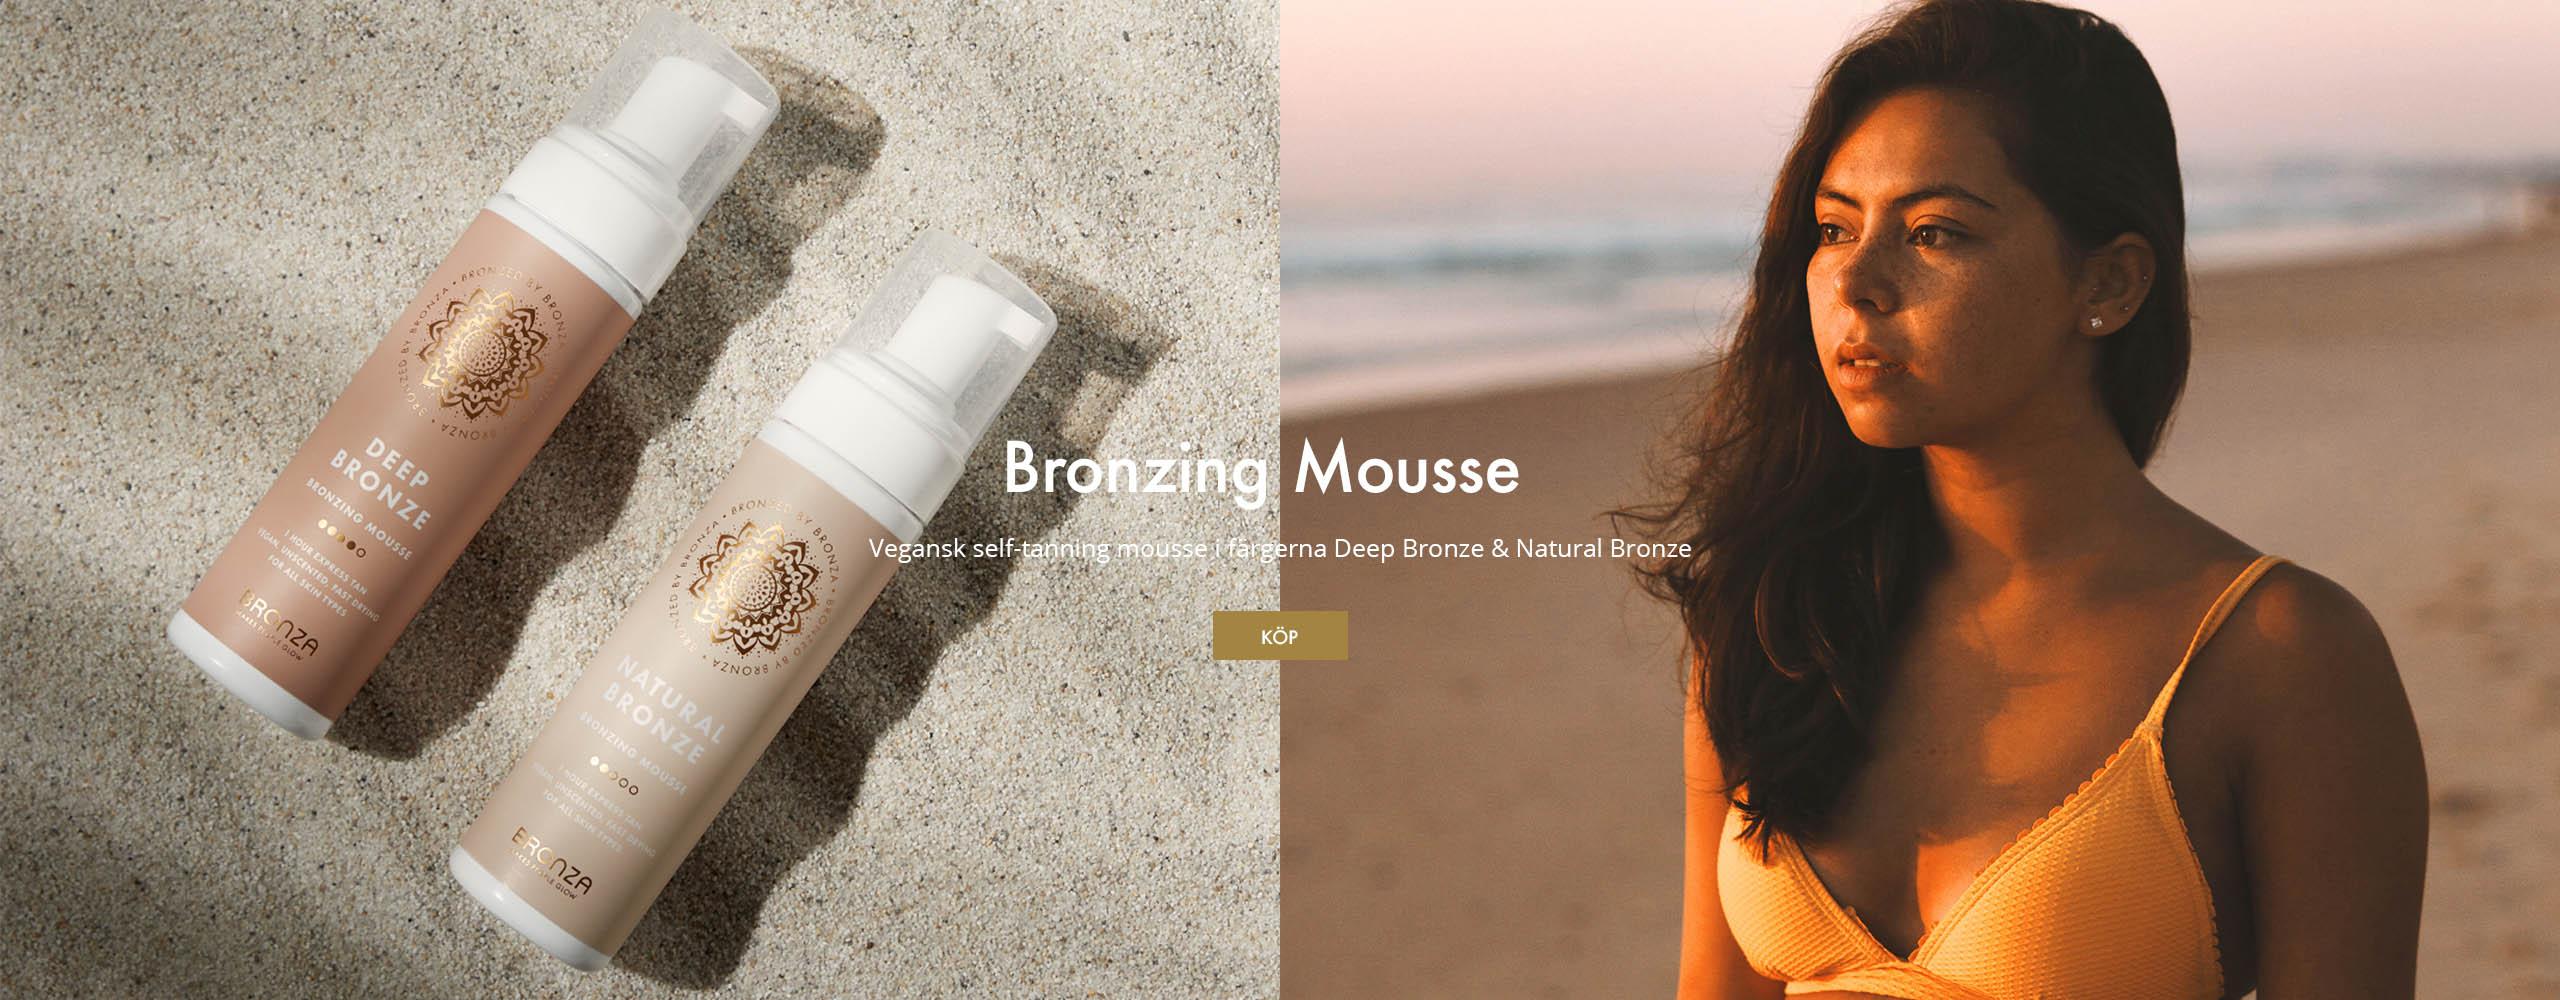 https://bronza.testavendre.se/image/750/Header_Bronzing_mousse_bronzing-products-bronza-selftanning_med_text_2560x1000px.jpg